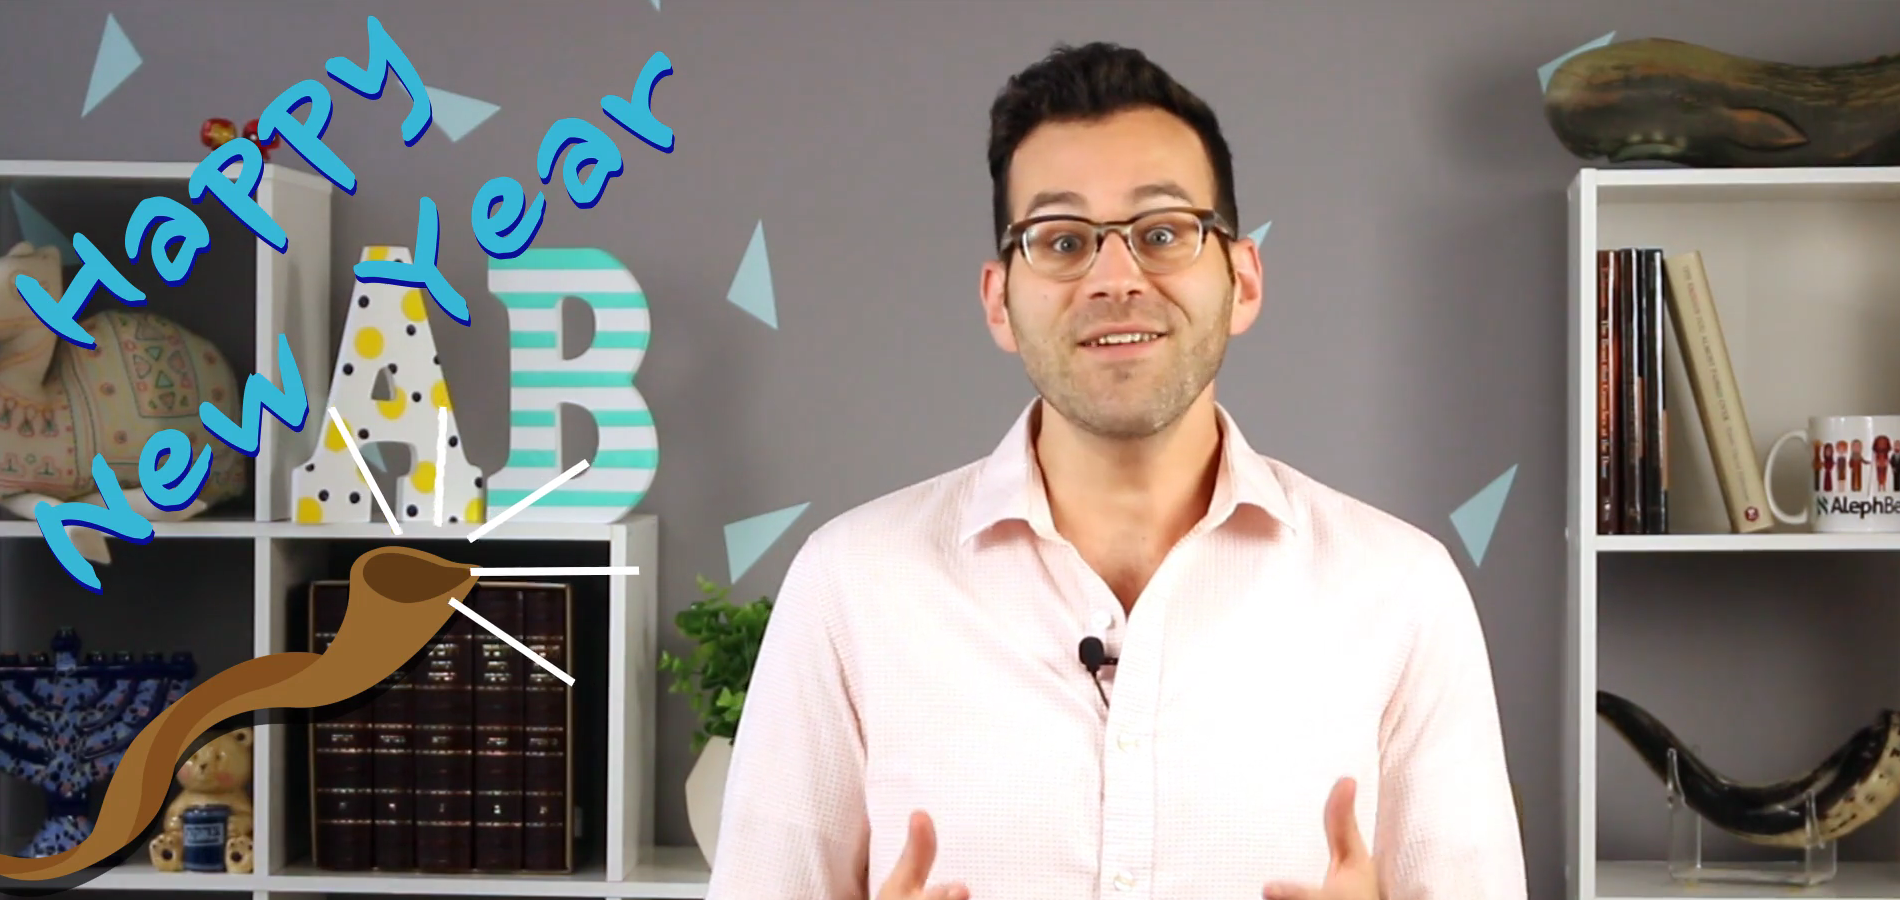 Aleph Beta on Rosh Hashana: How to Prepare